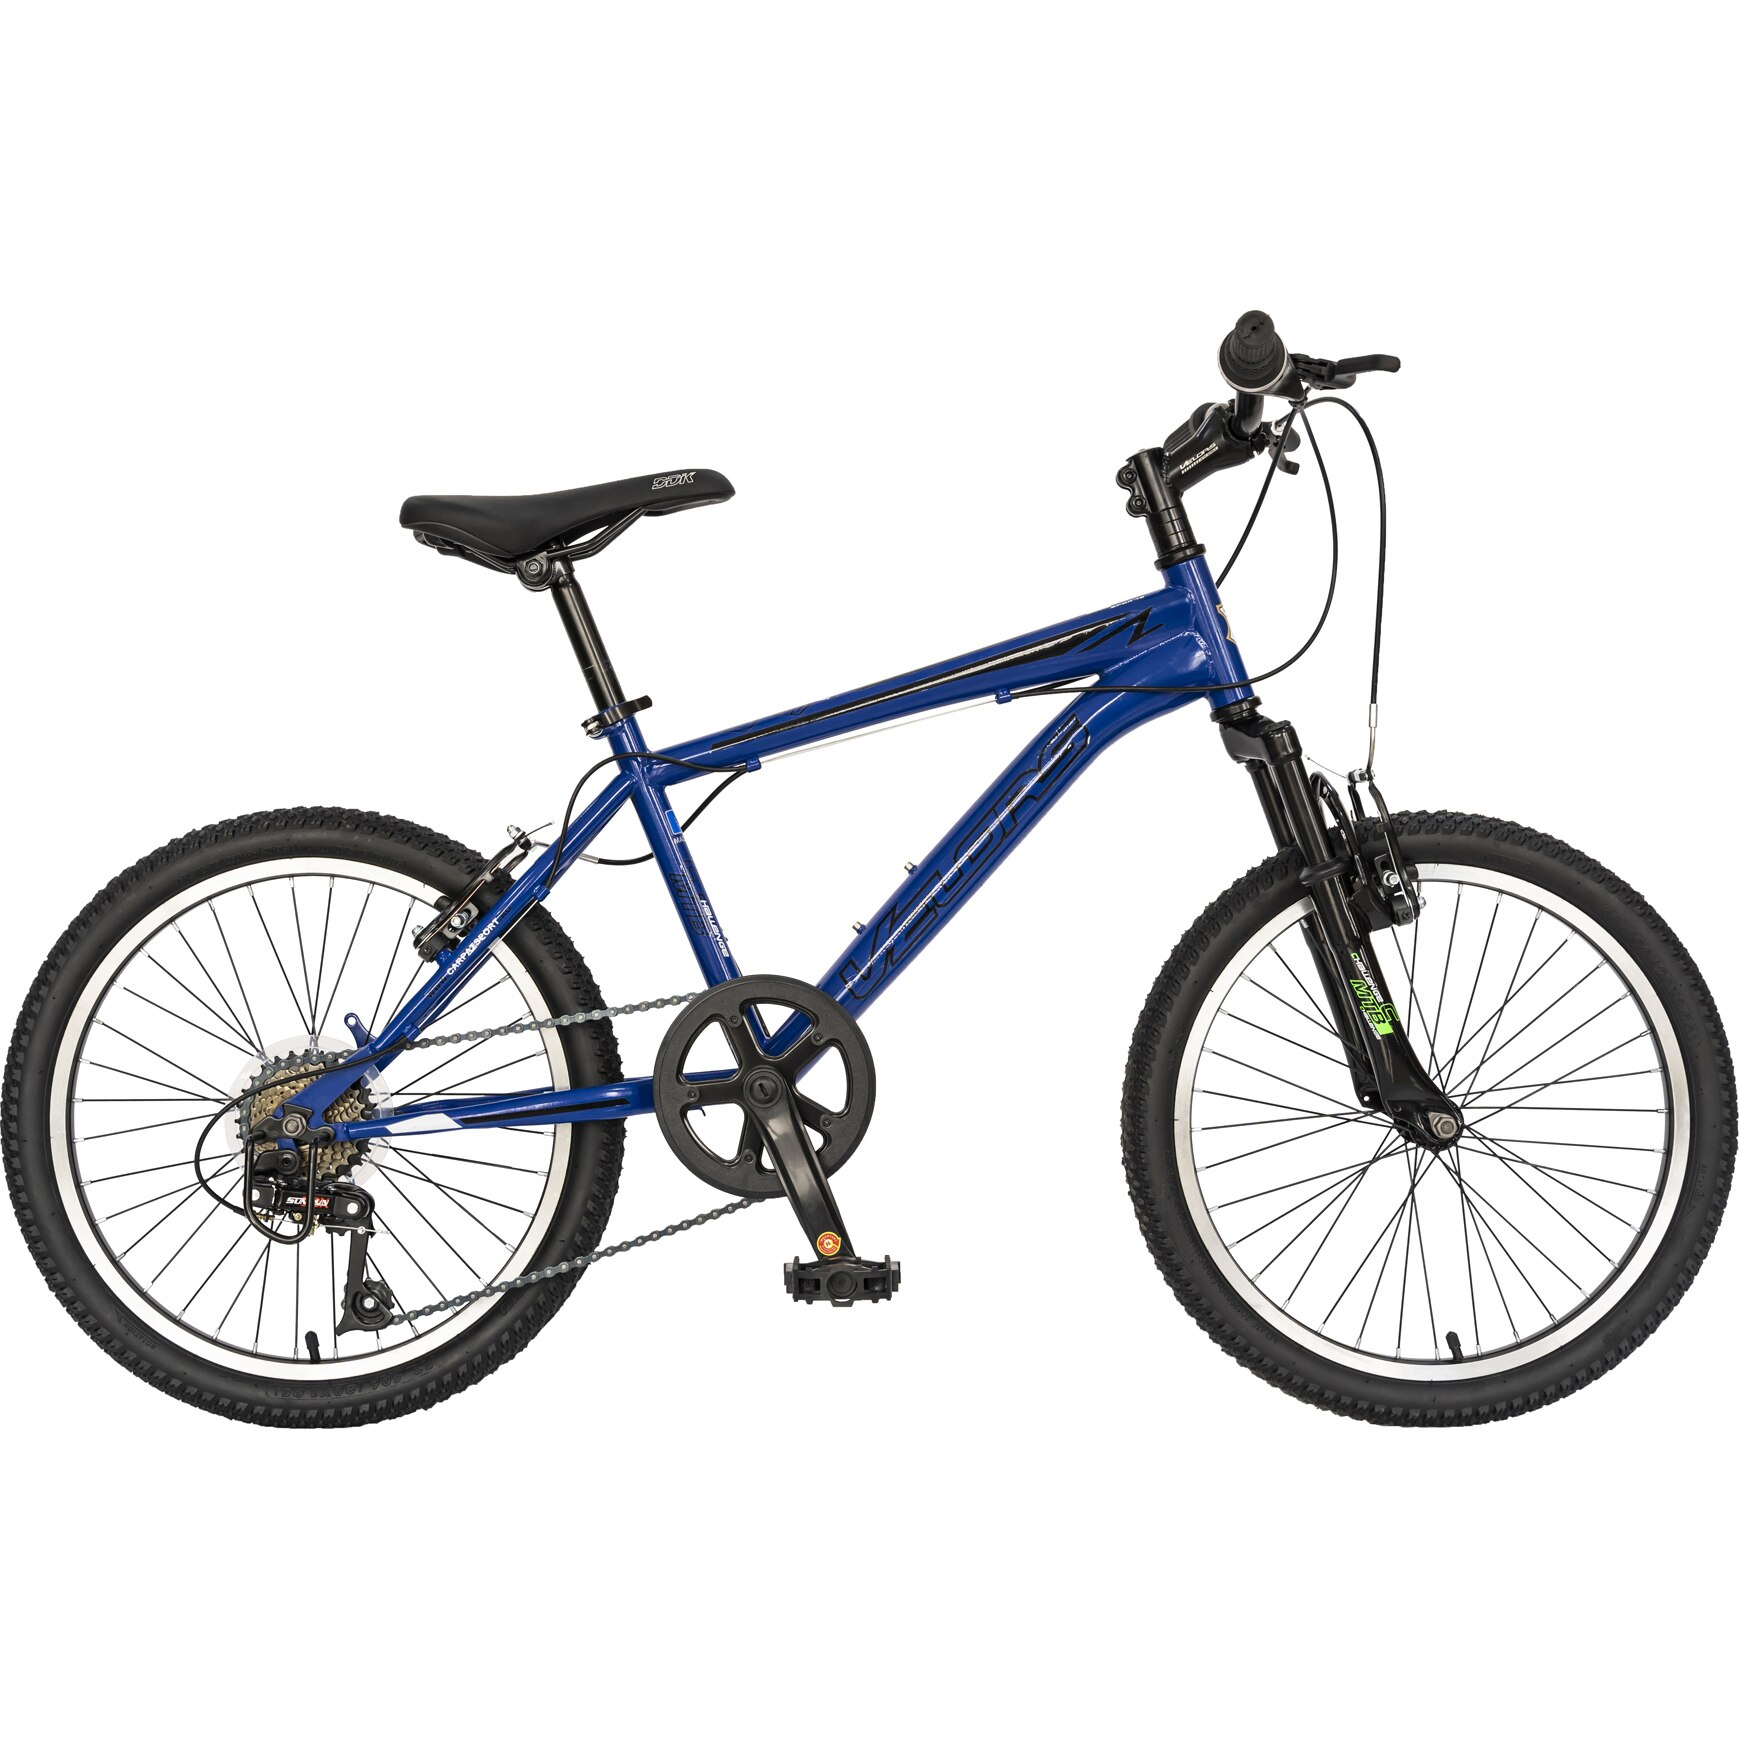 "Fotografie Bicicleta MTB 20"" Velors pentru copii V2010A, Albastru/Negru"